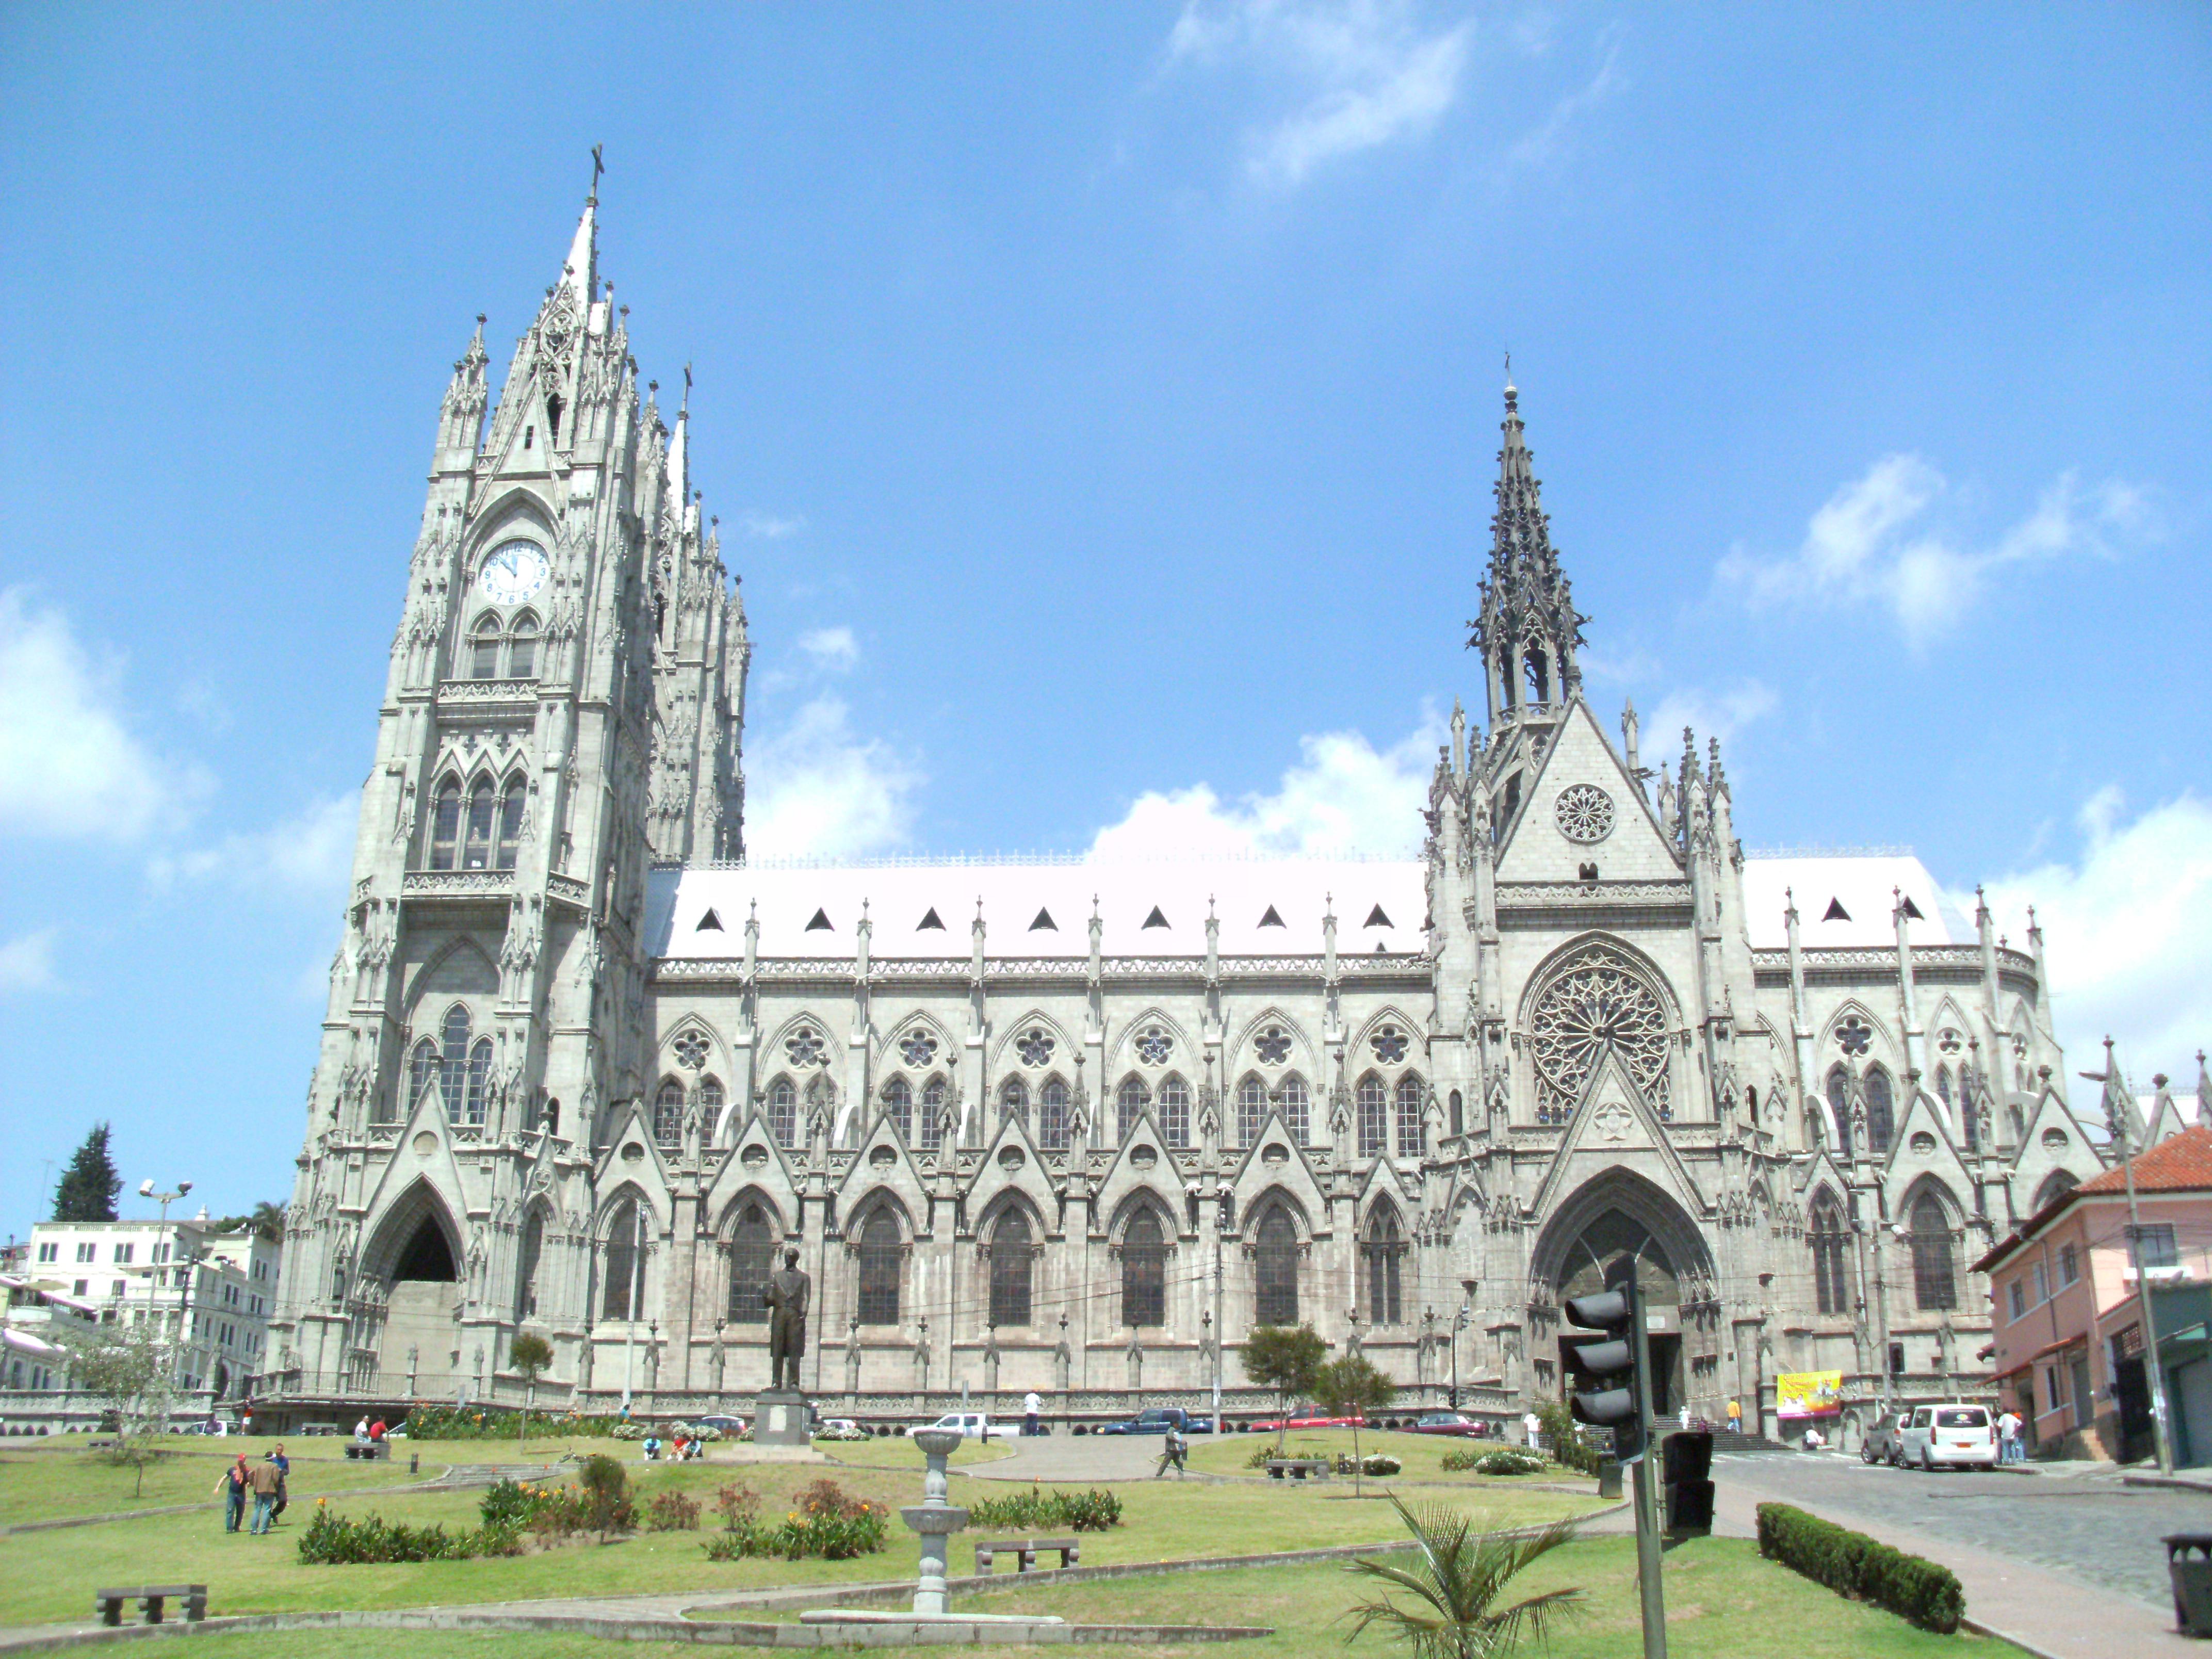 Basílica del Voto Nacional - Wikipedia, la enciclopedia libre